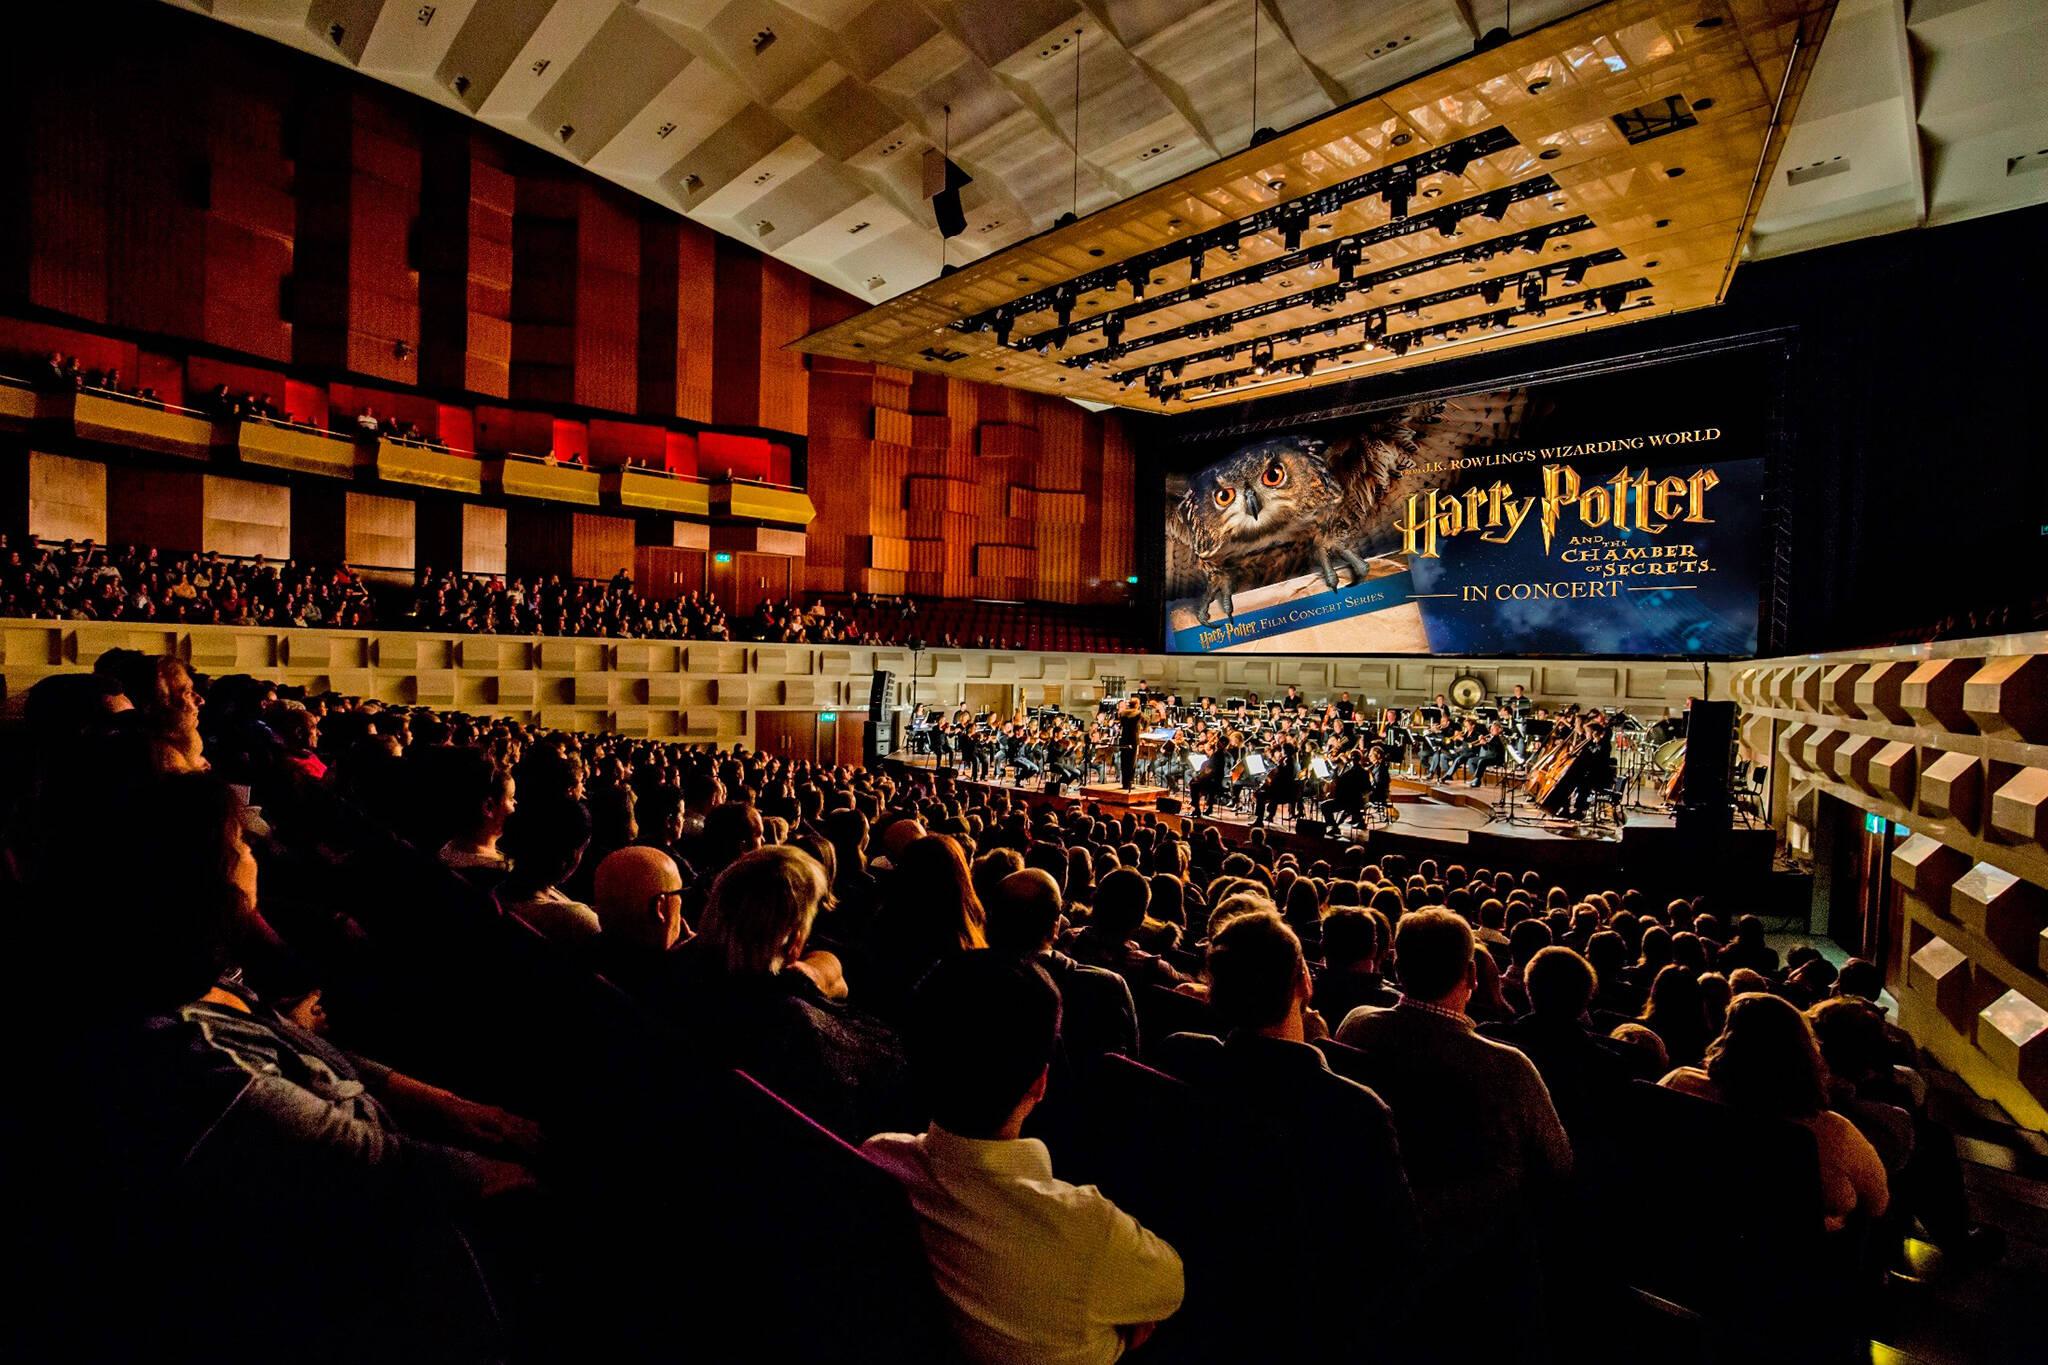 harry potter concert